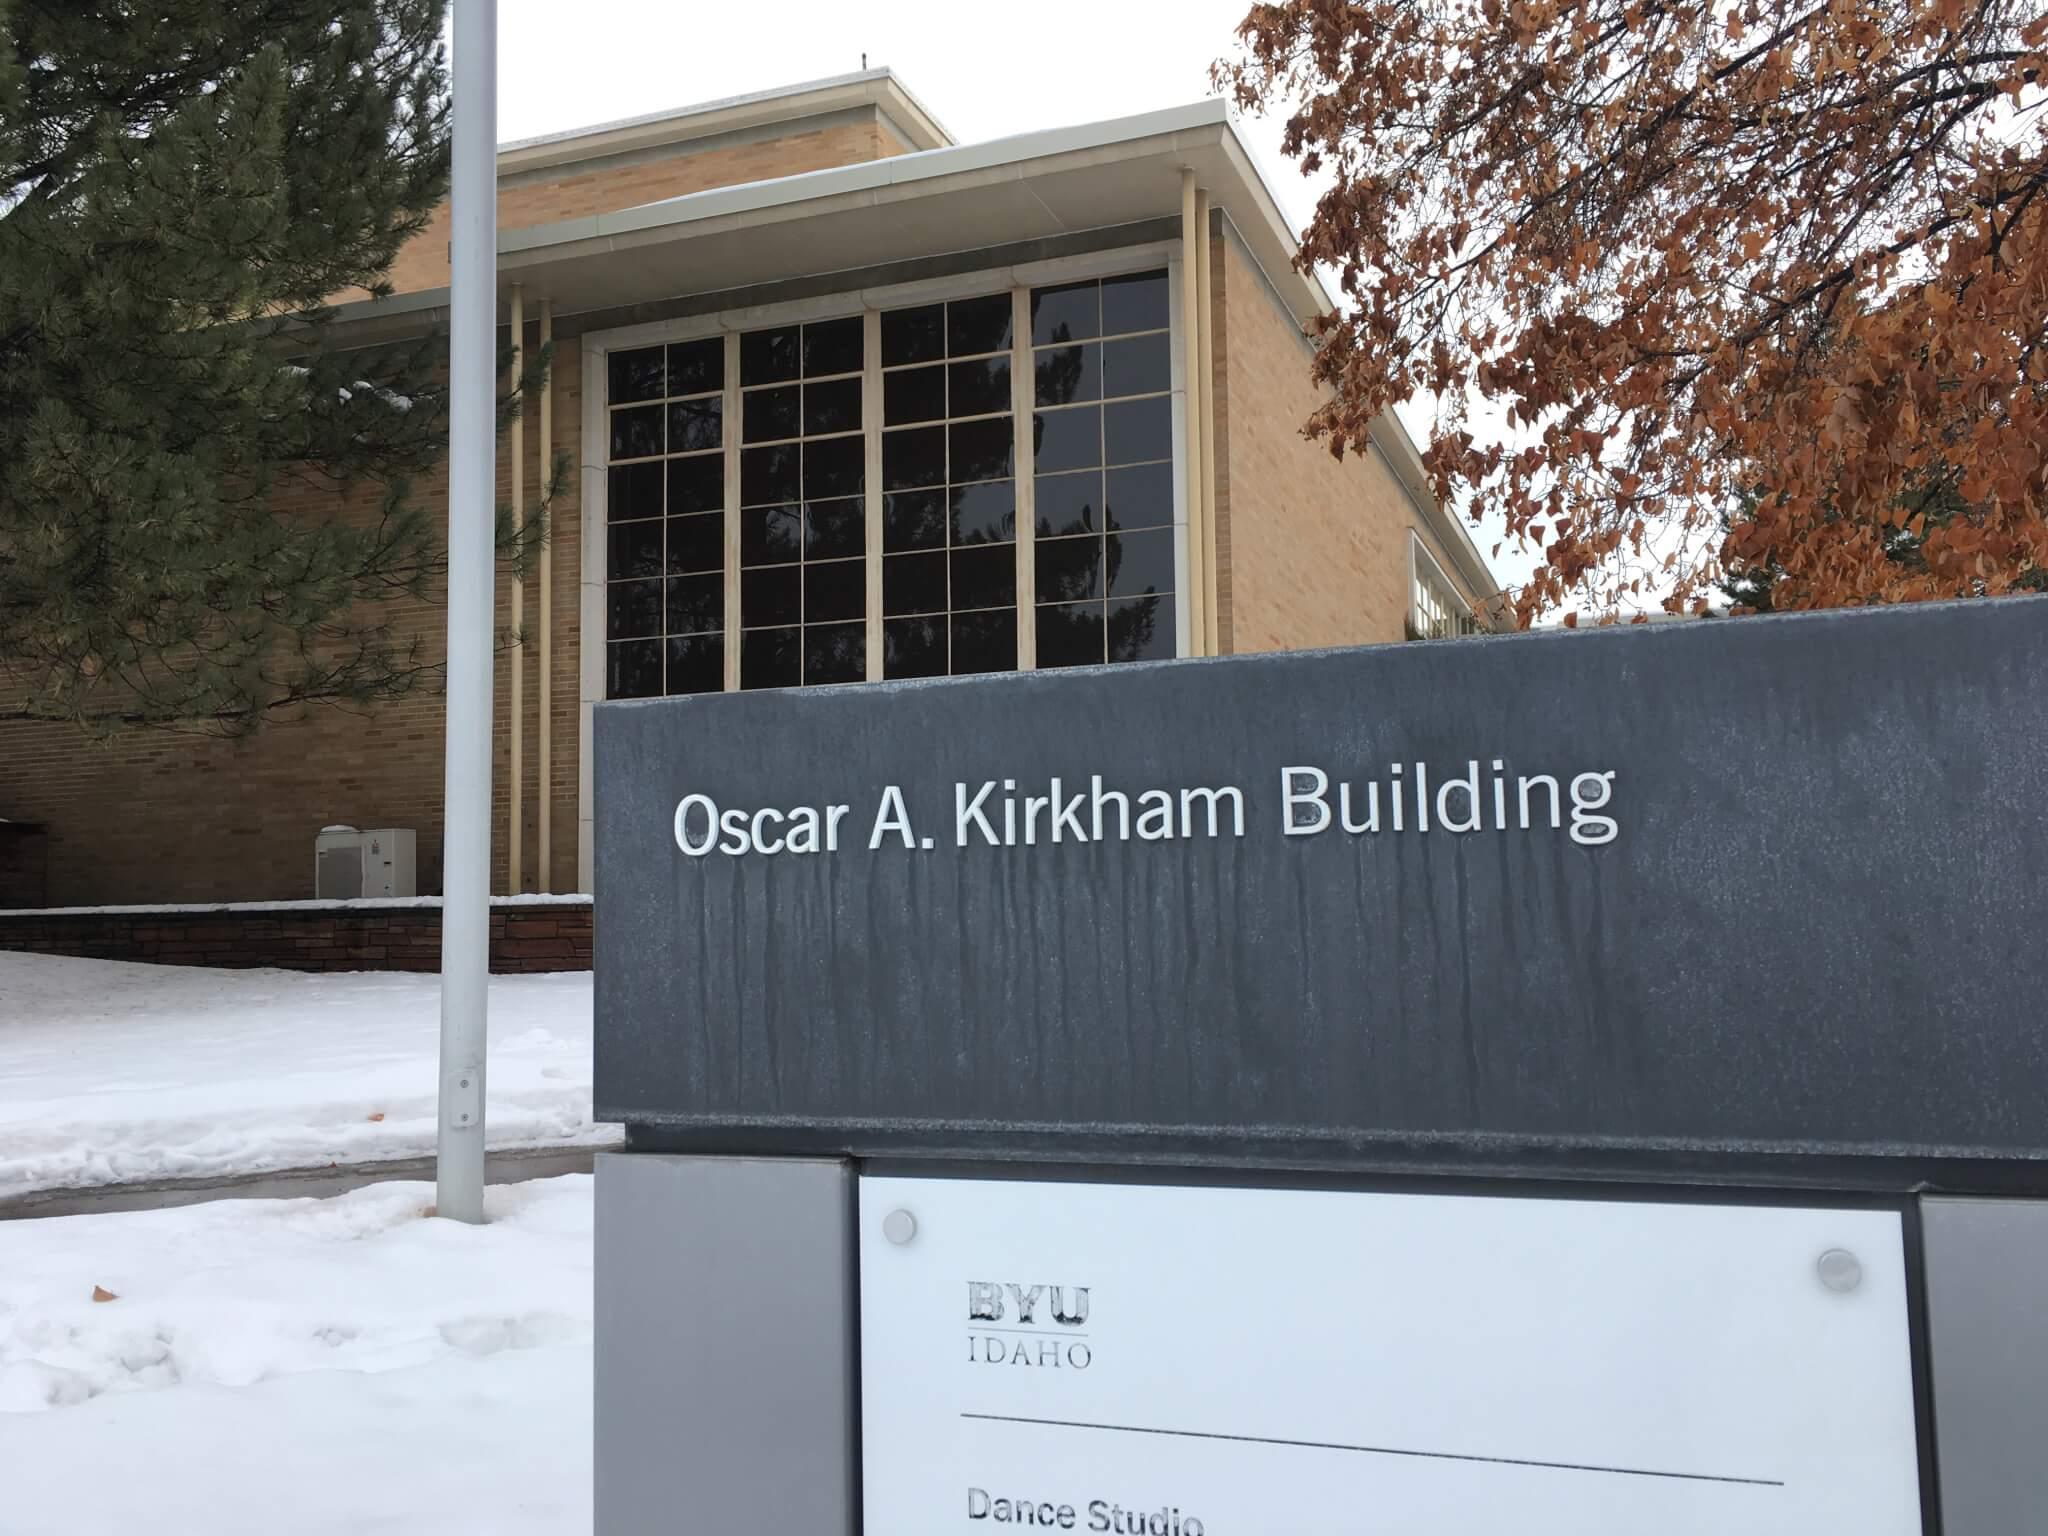 Kirkham Entrance Sign